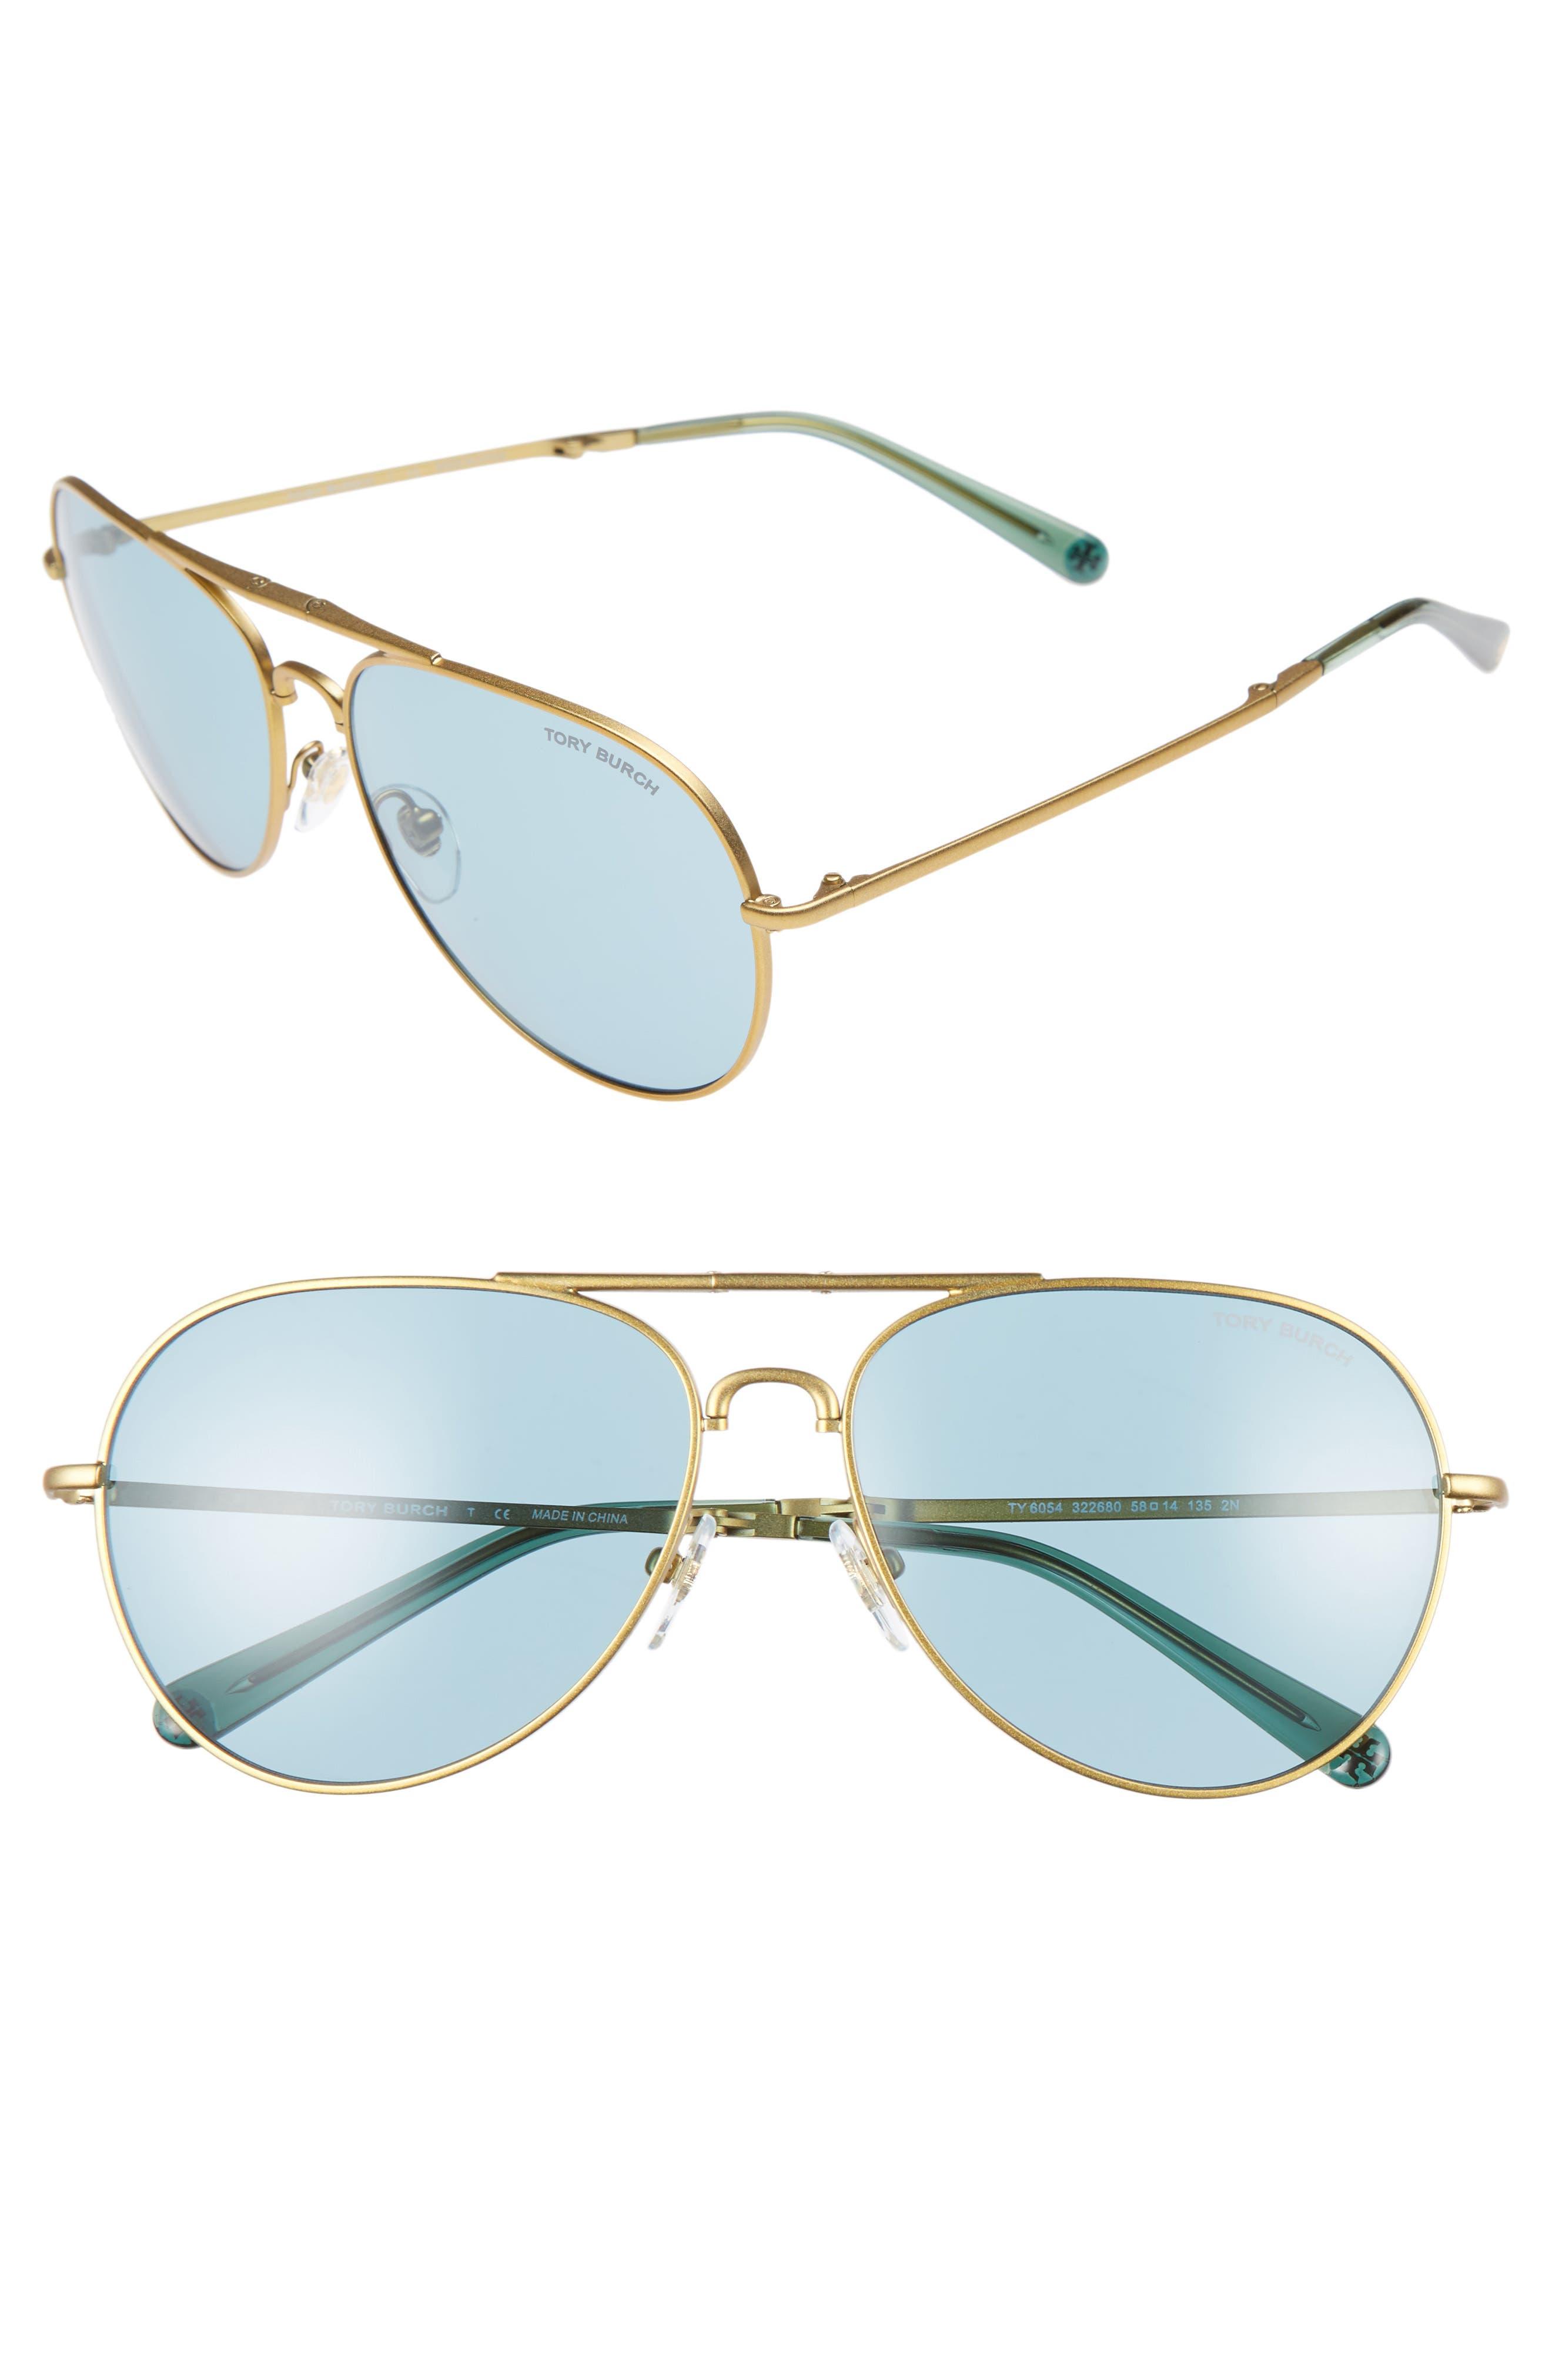 58mm Foldable Aviator Sunglasses,                             Main thumbnail 1, color,                             710